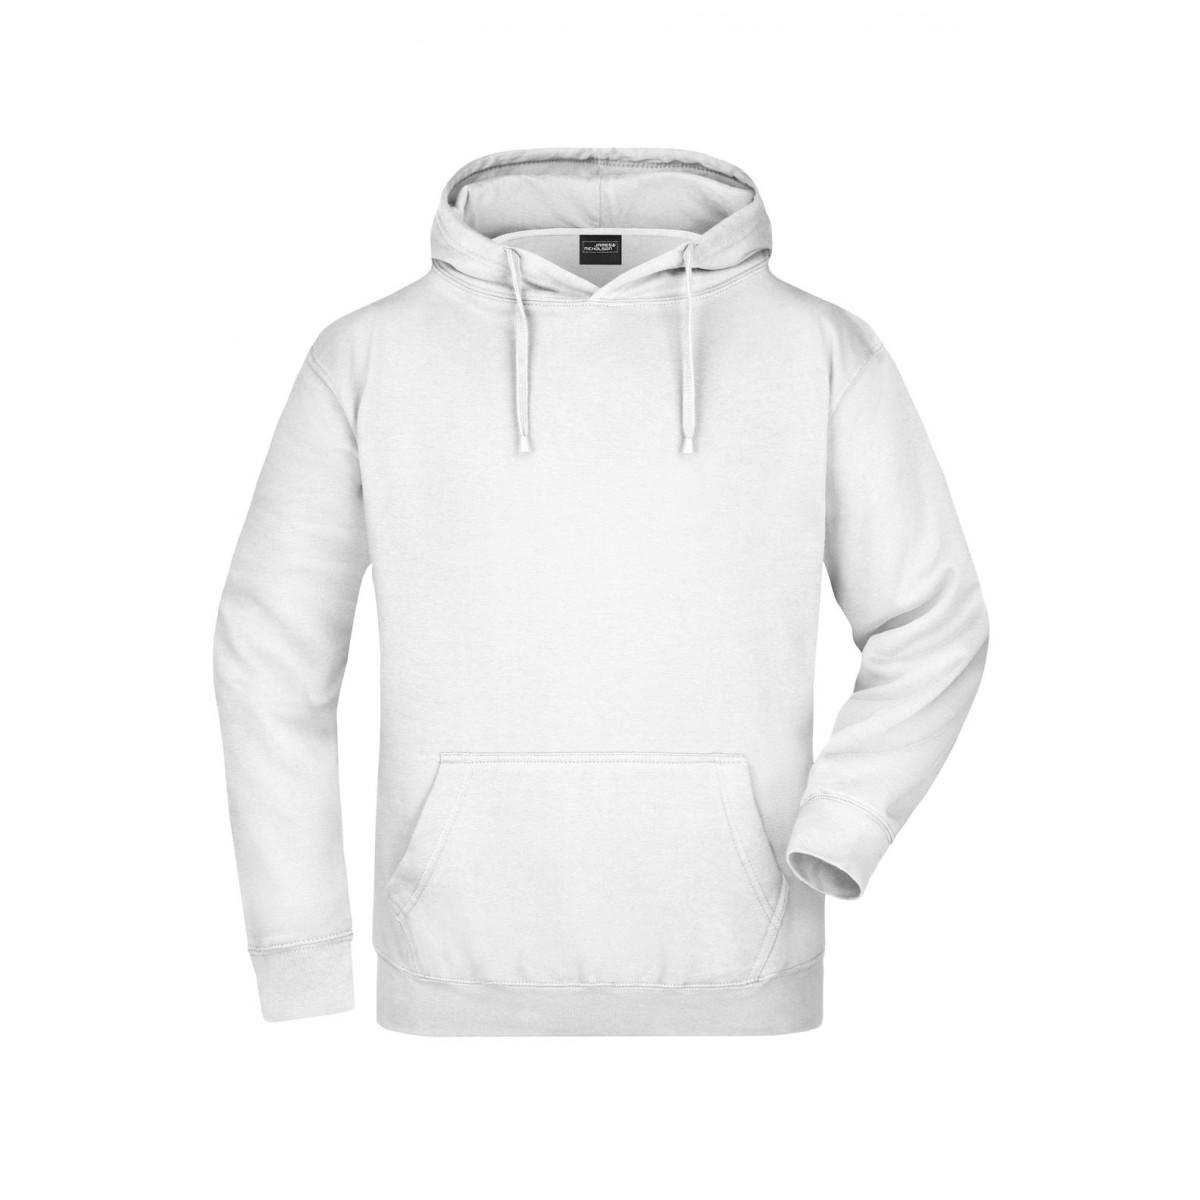 Толстовка мужская JN047 Hooded Sweat - Белый